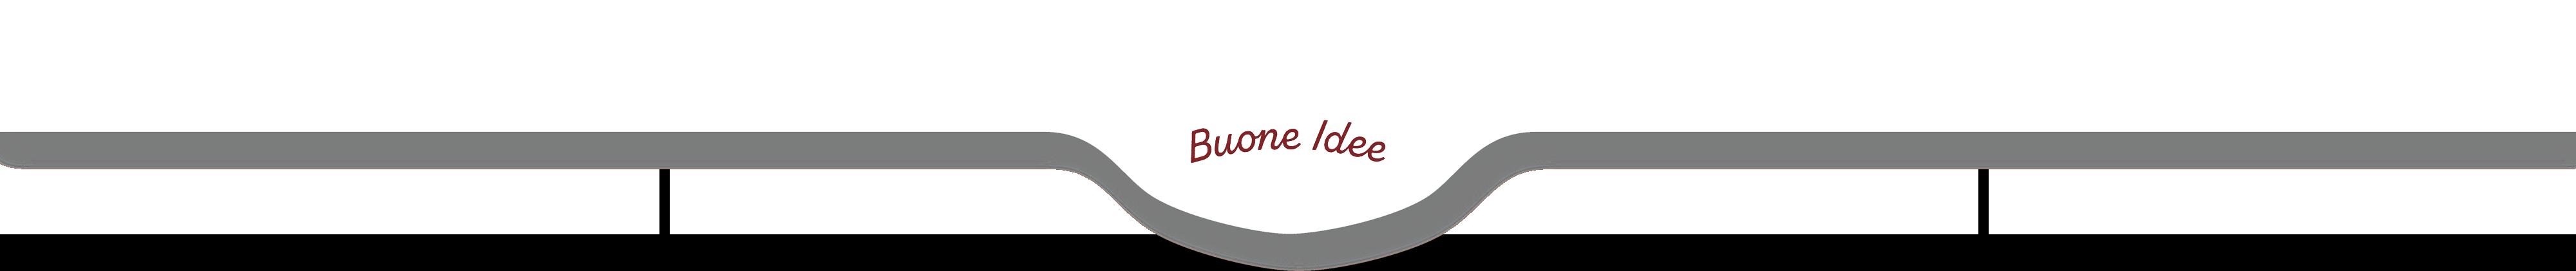 buone-idee-header-sito-new